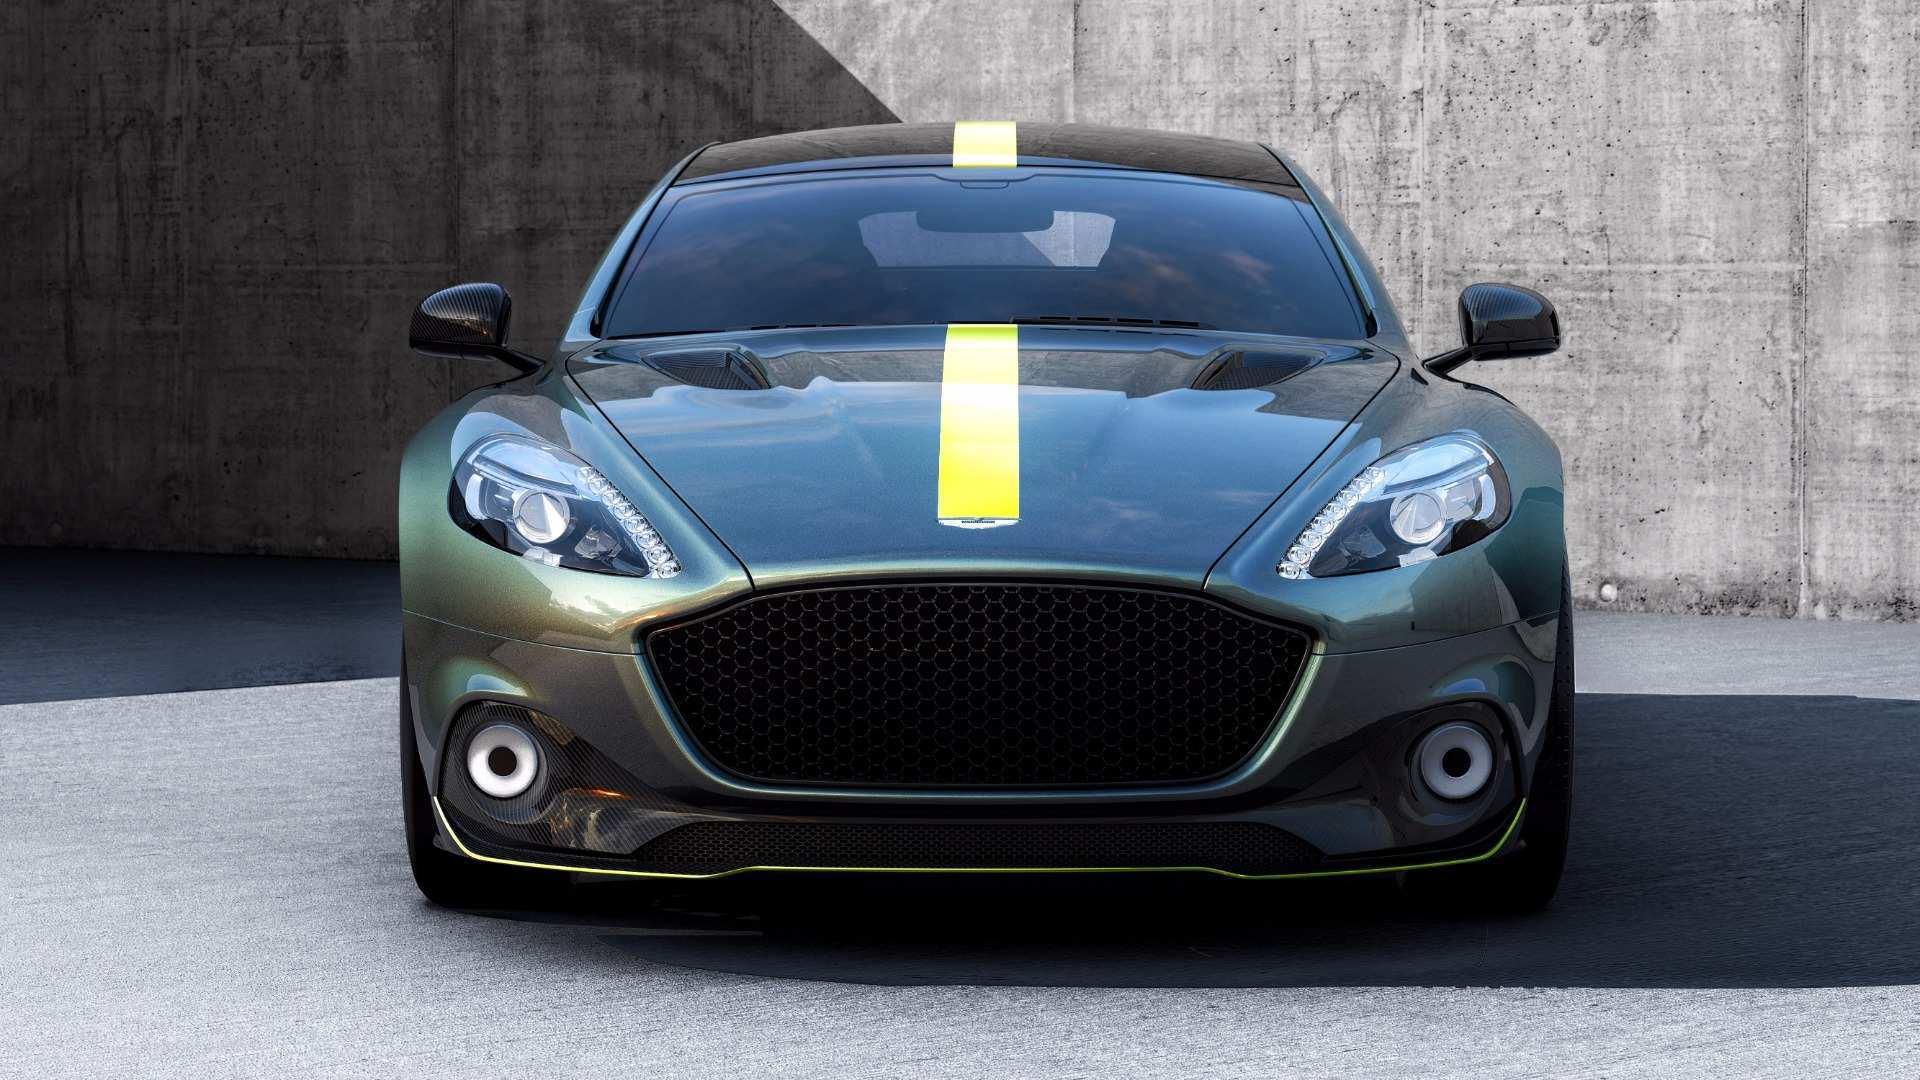 16 Concept of 2019 Aston Martin Rapide Release for 2019 Aston Martin Rapide